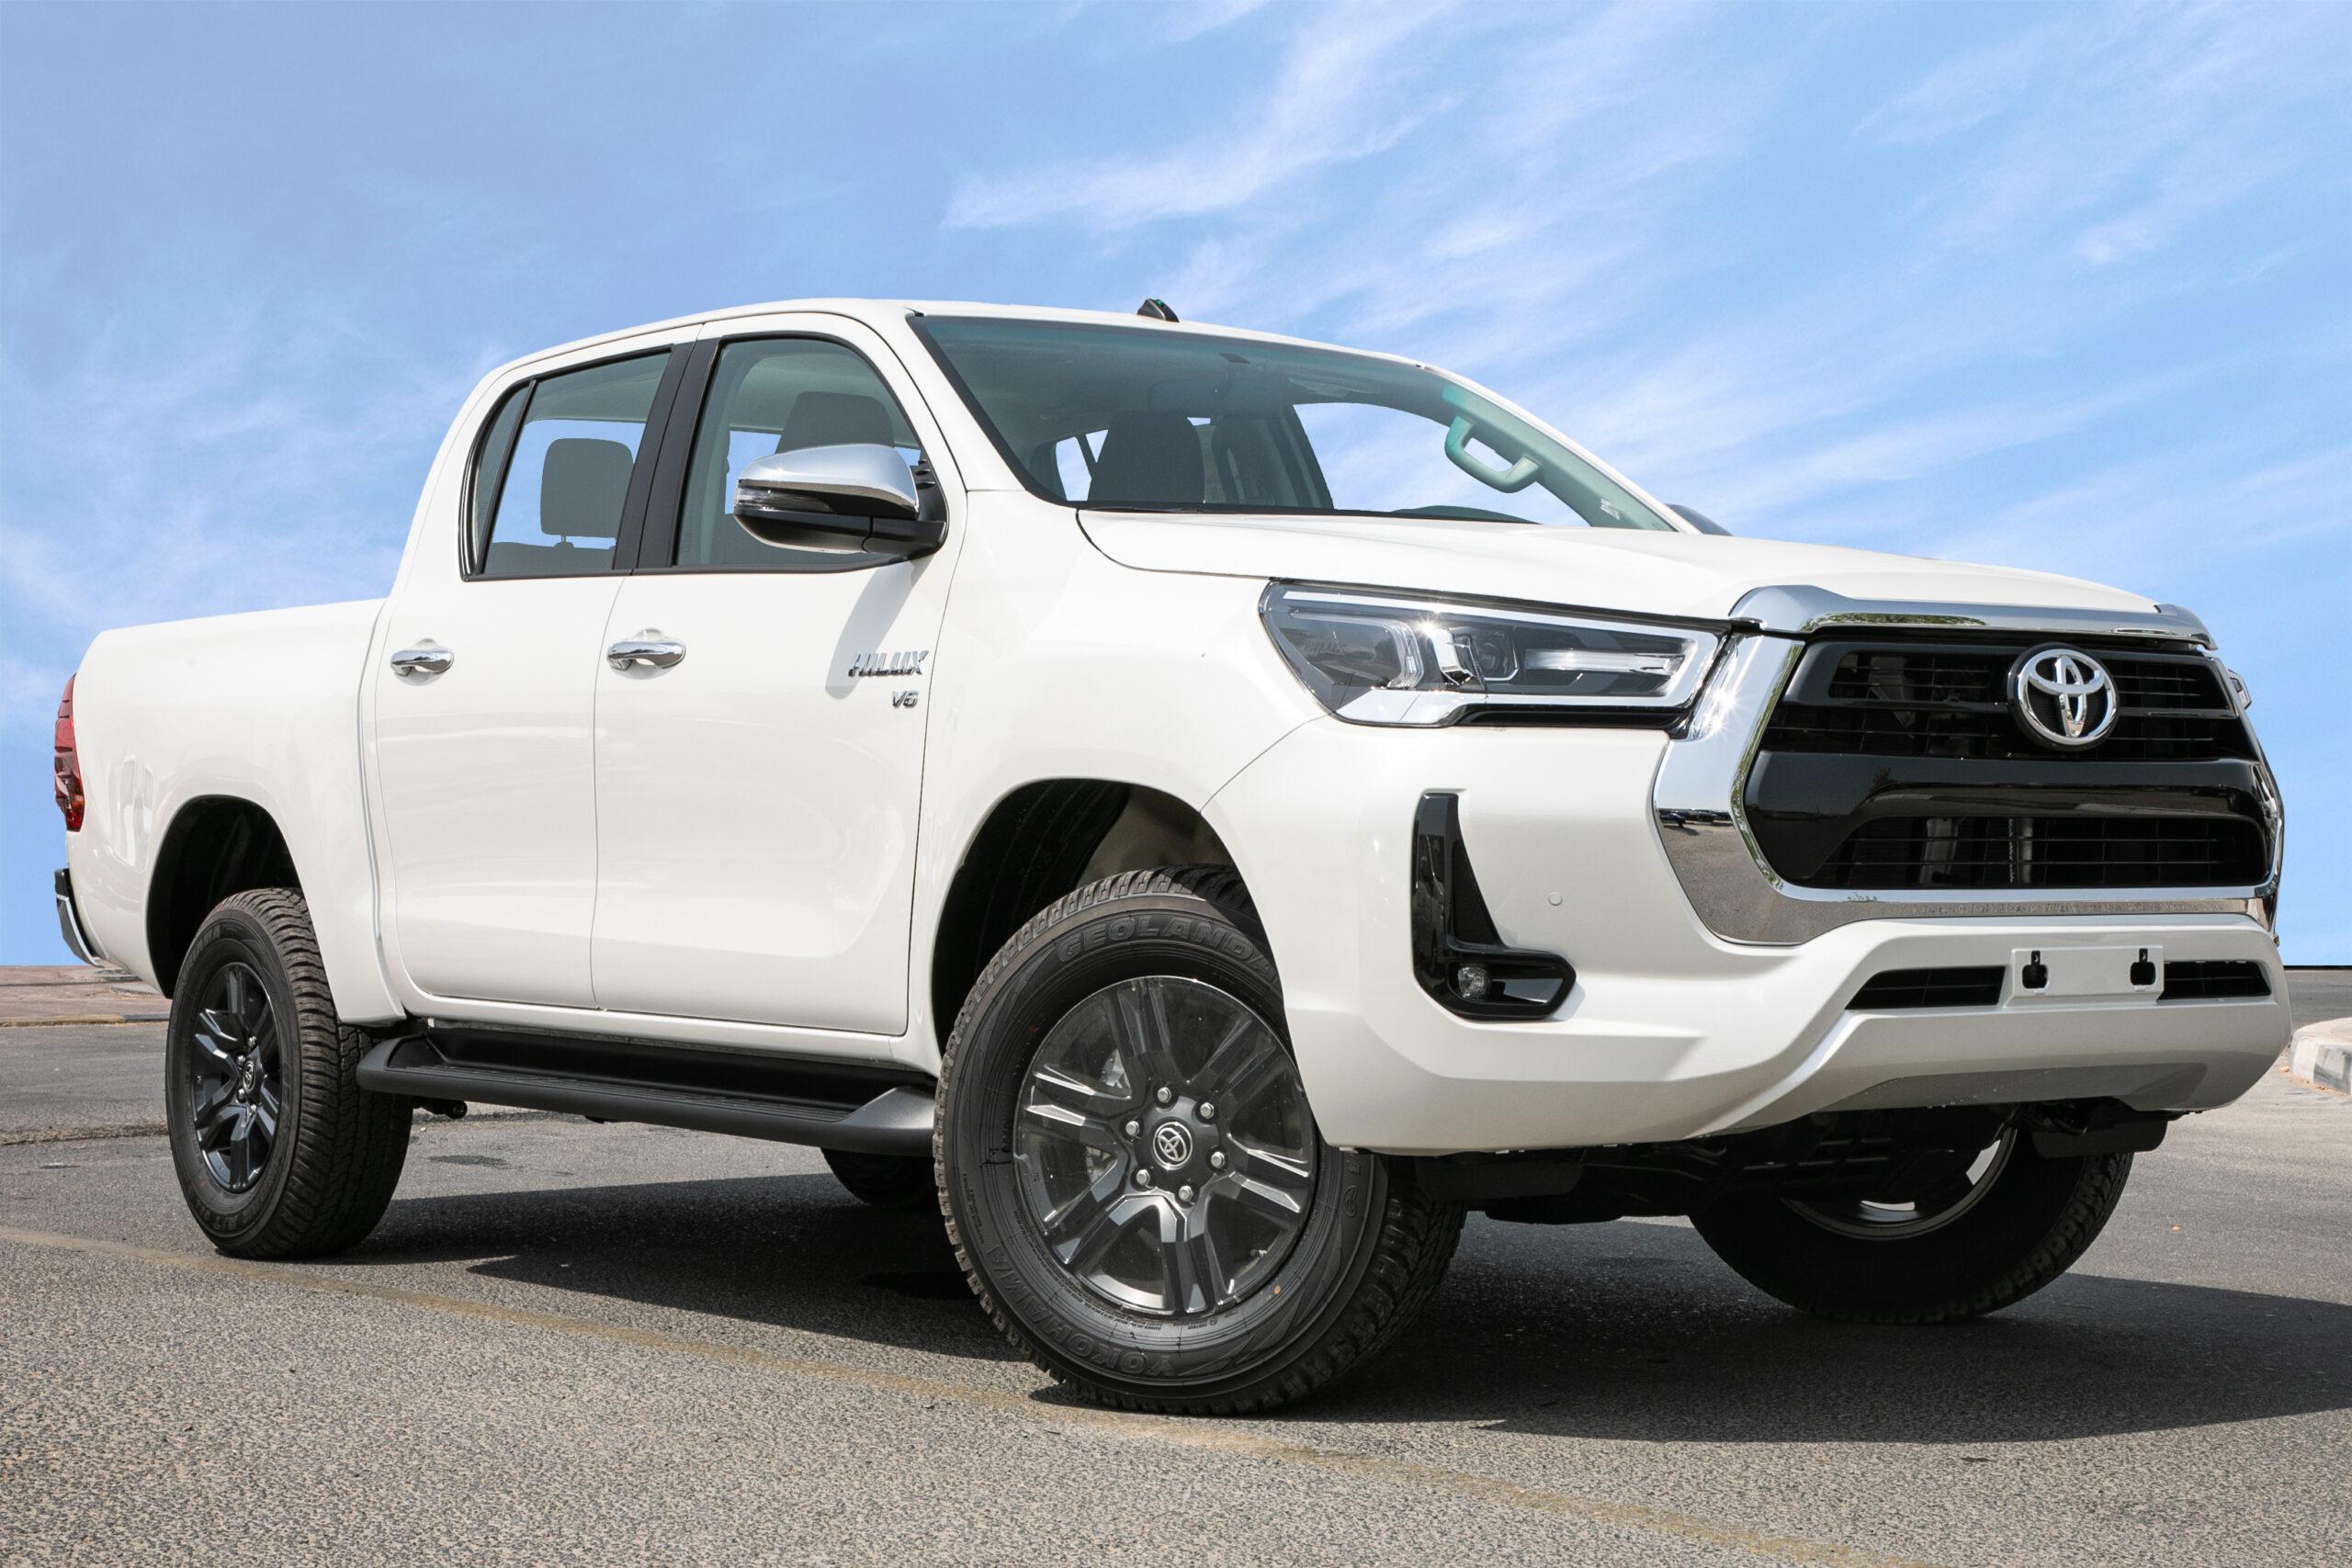 Kelebihan Toyota Hilux 4X4 Tangguh